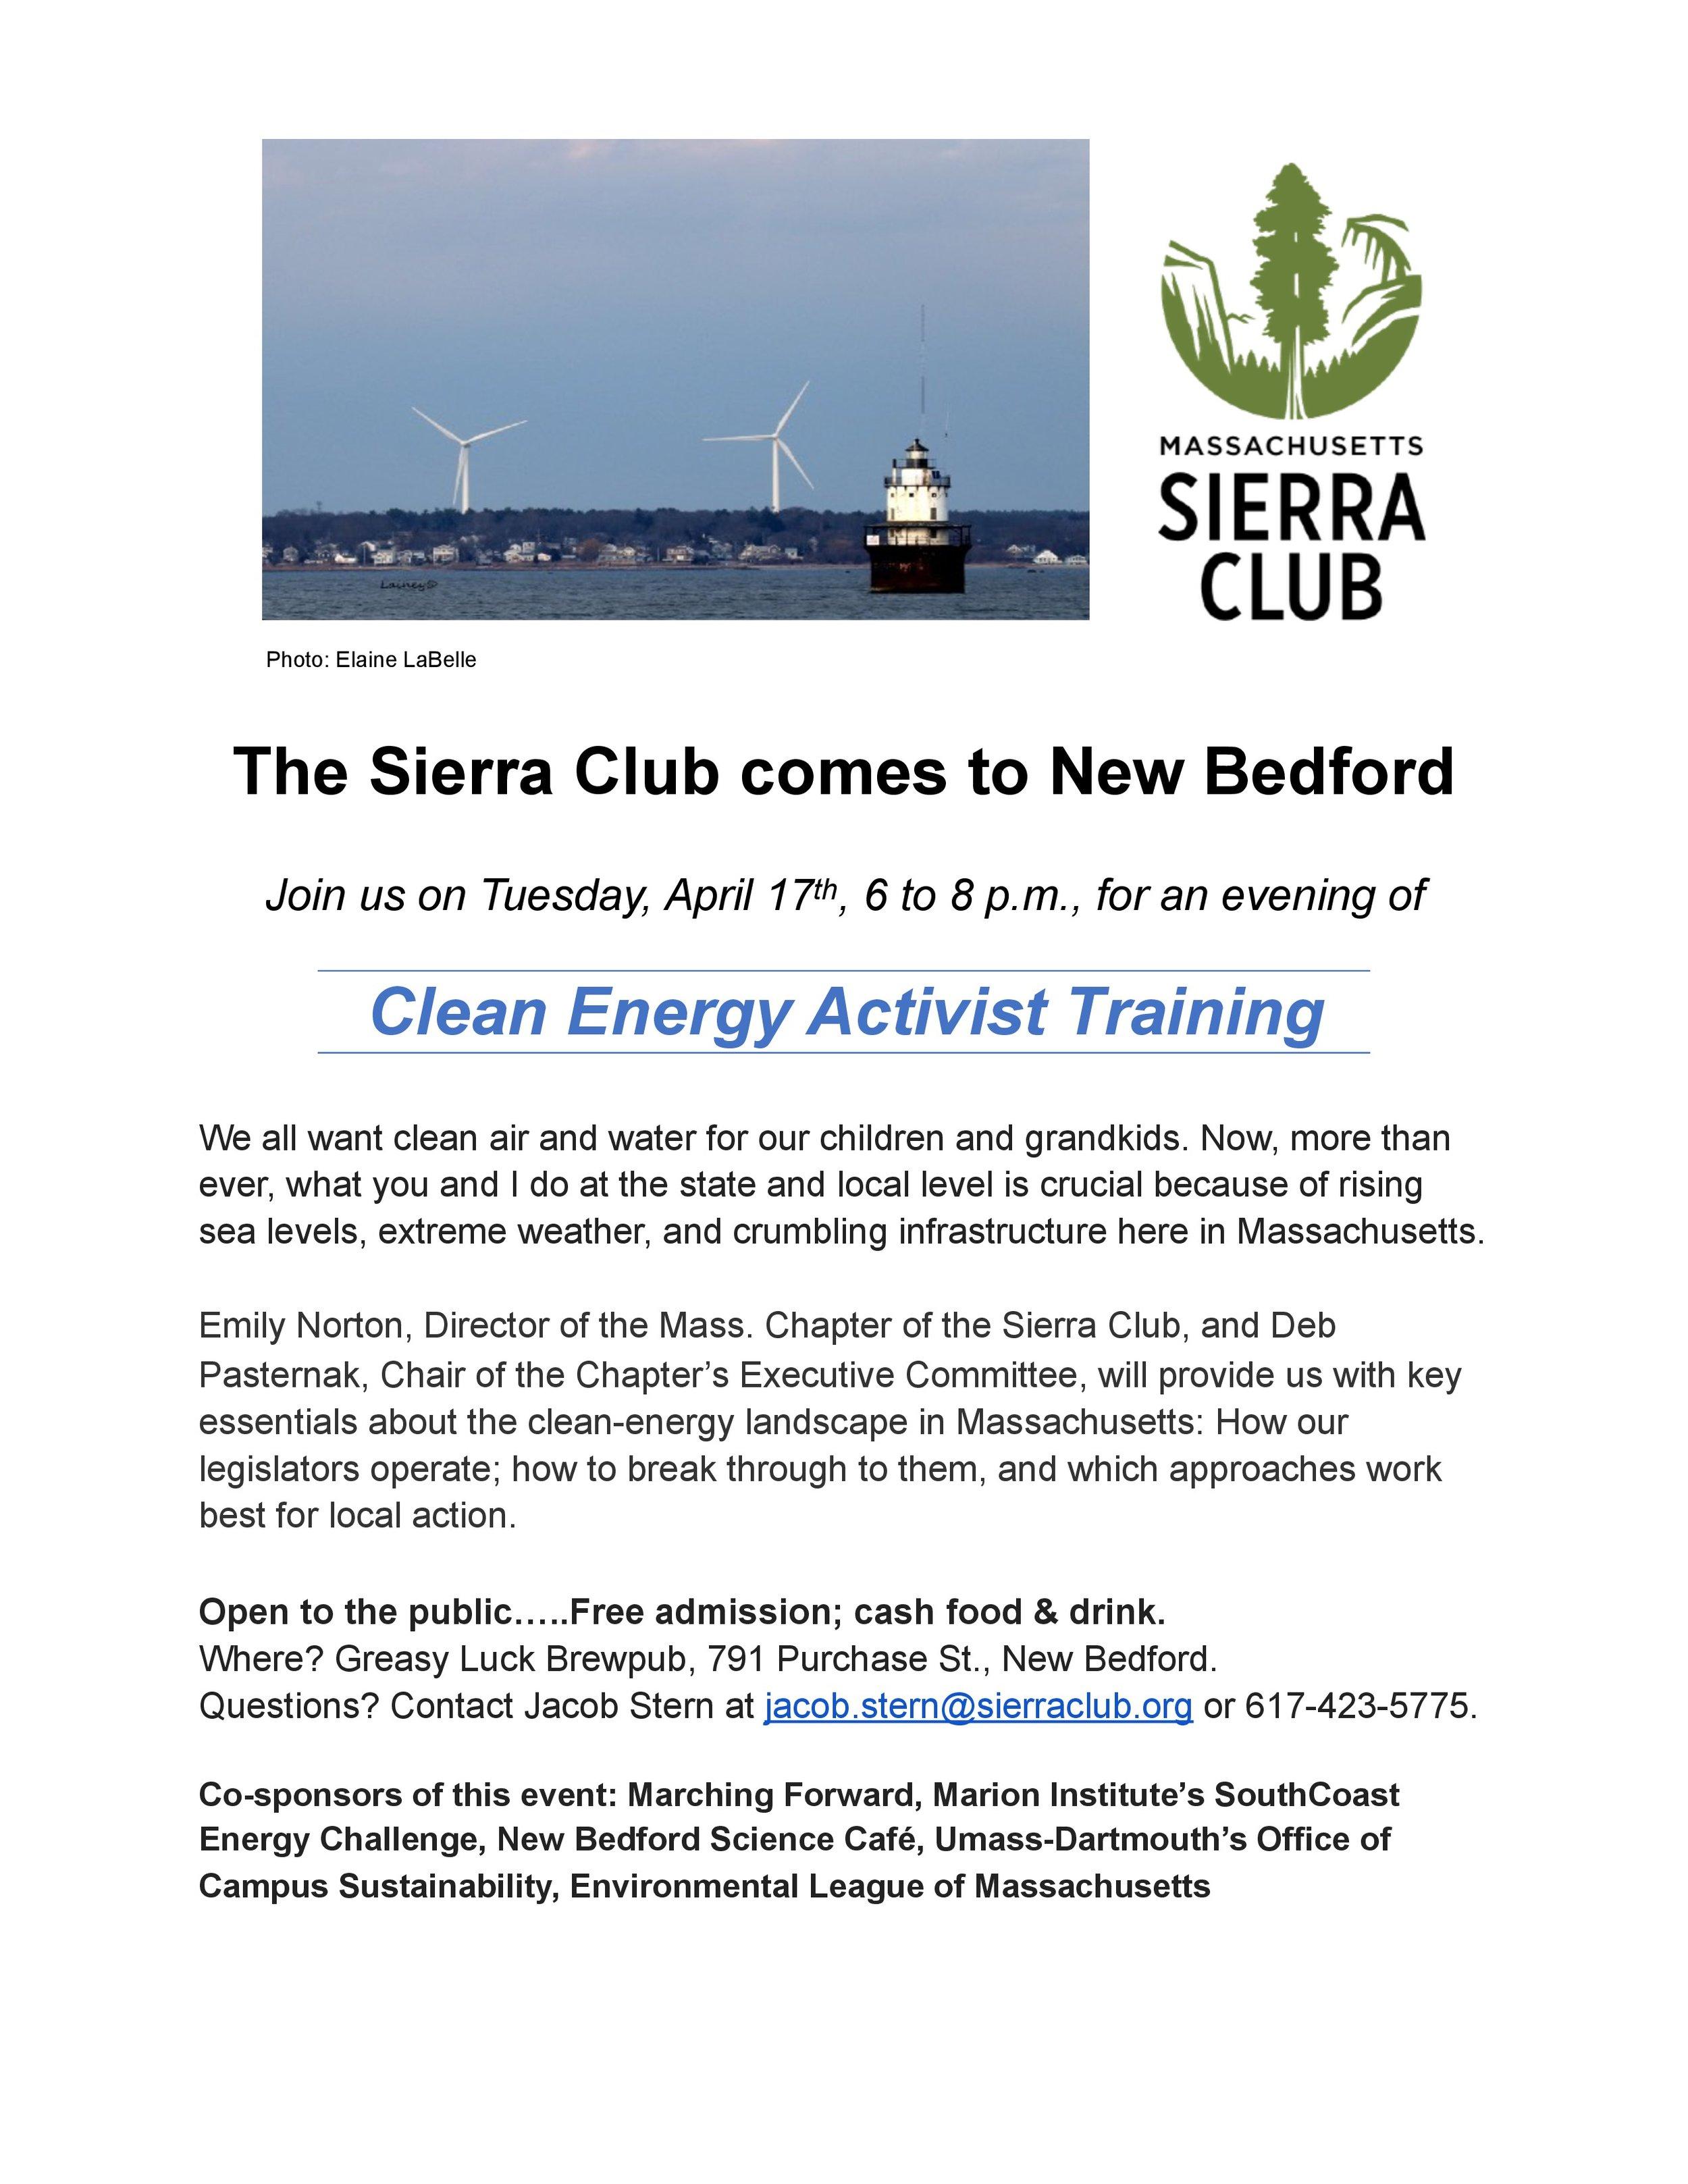 Sierra Club Event.jpg